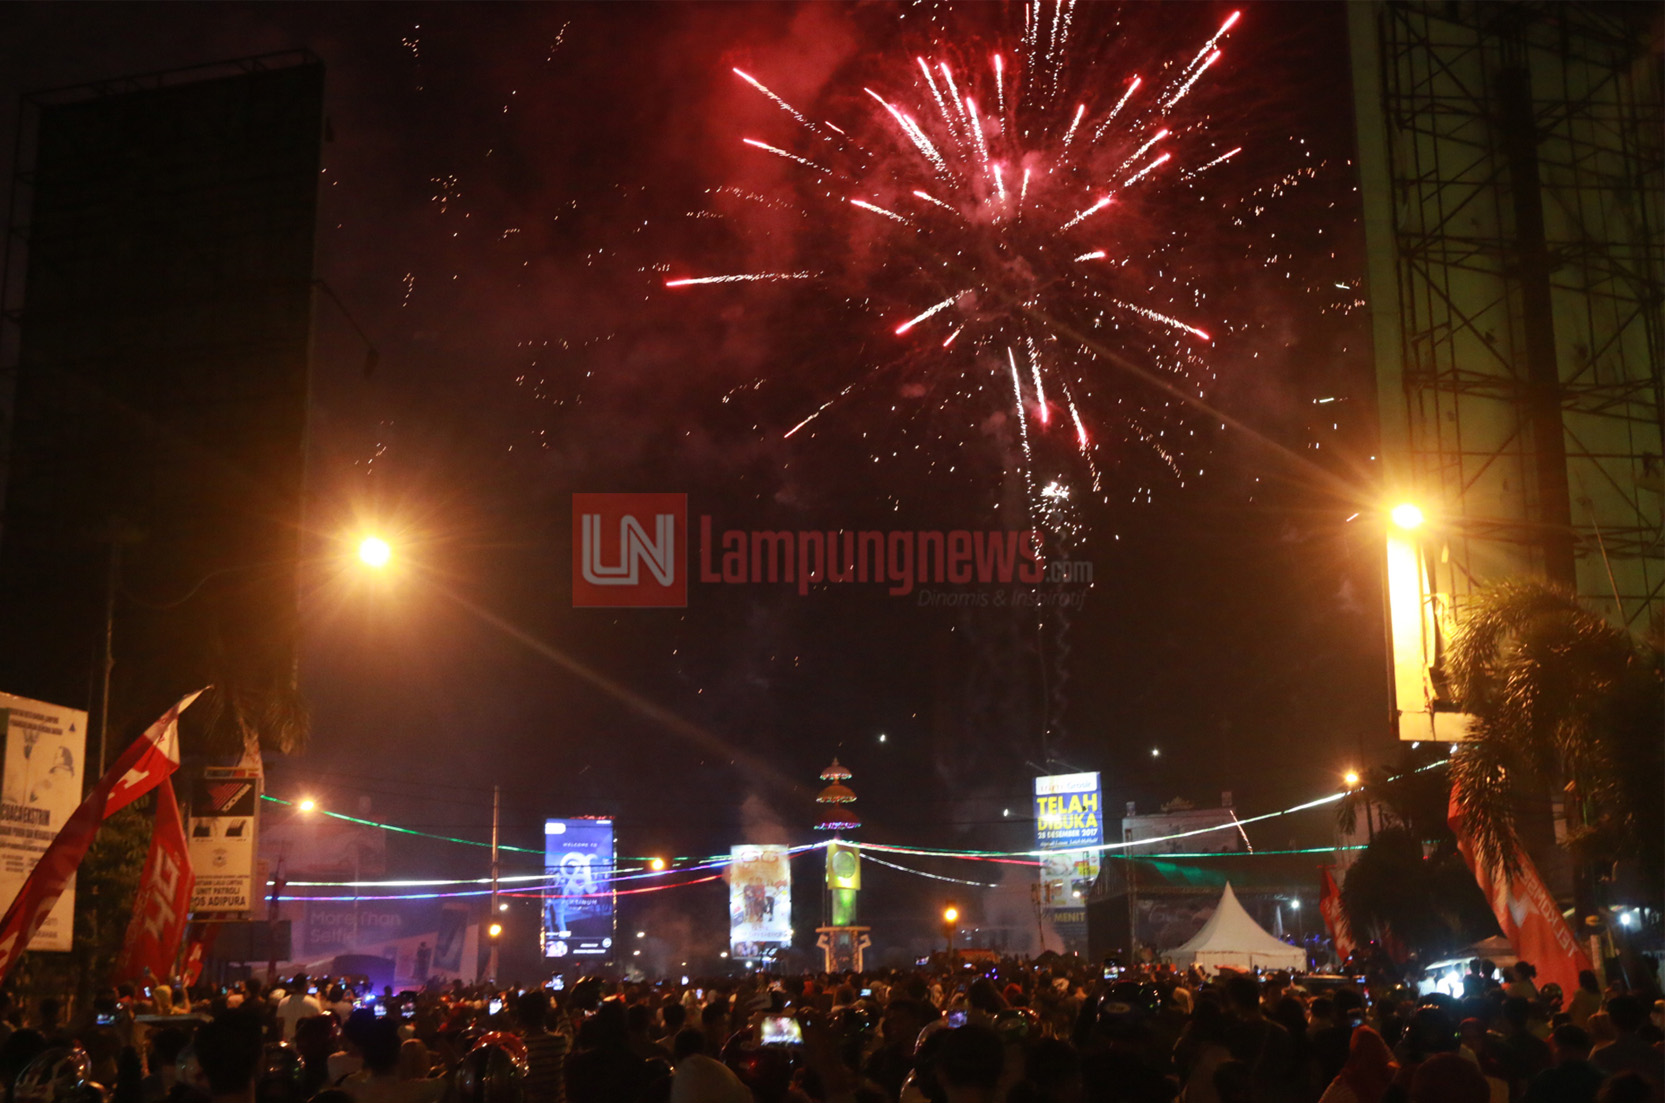 Ribuan warga memadati Tugu Adipura untuk menyaksikan pesta kembang api pada malam pergantian tahun pada 31 Desember 2017 menuju 1 Januari 2018. Momen pesta kembang api ini banyak diabadikan warga melalui kamera ponsel. (Lampungnews.com/El Shinta)